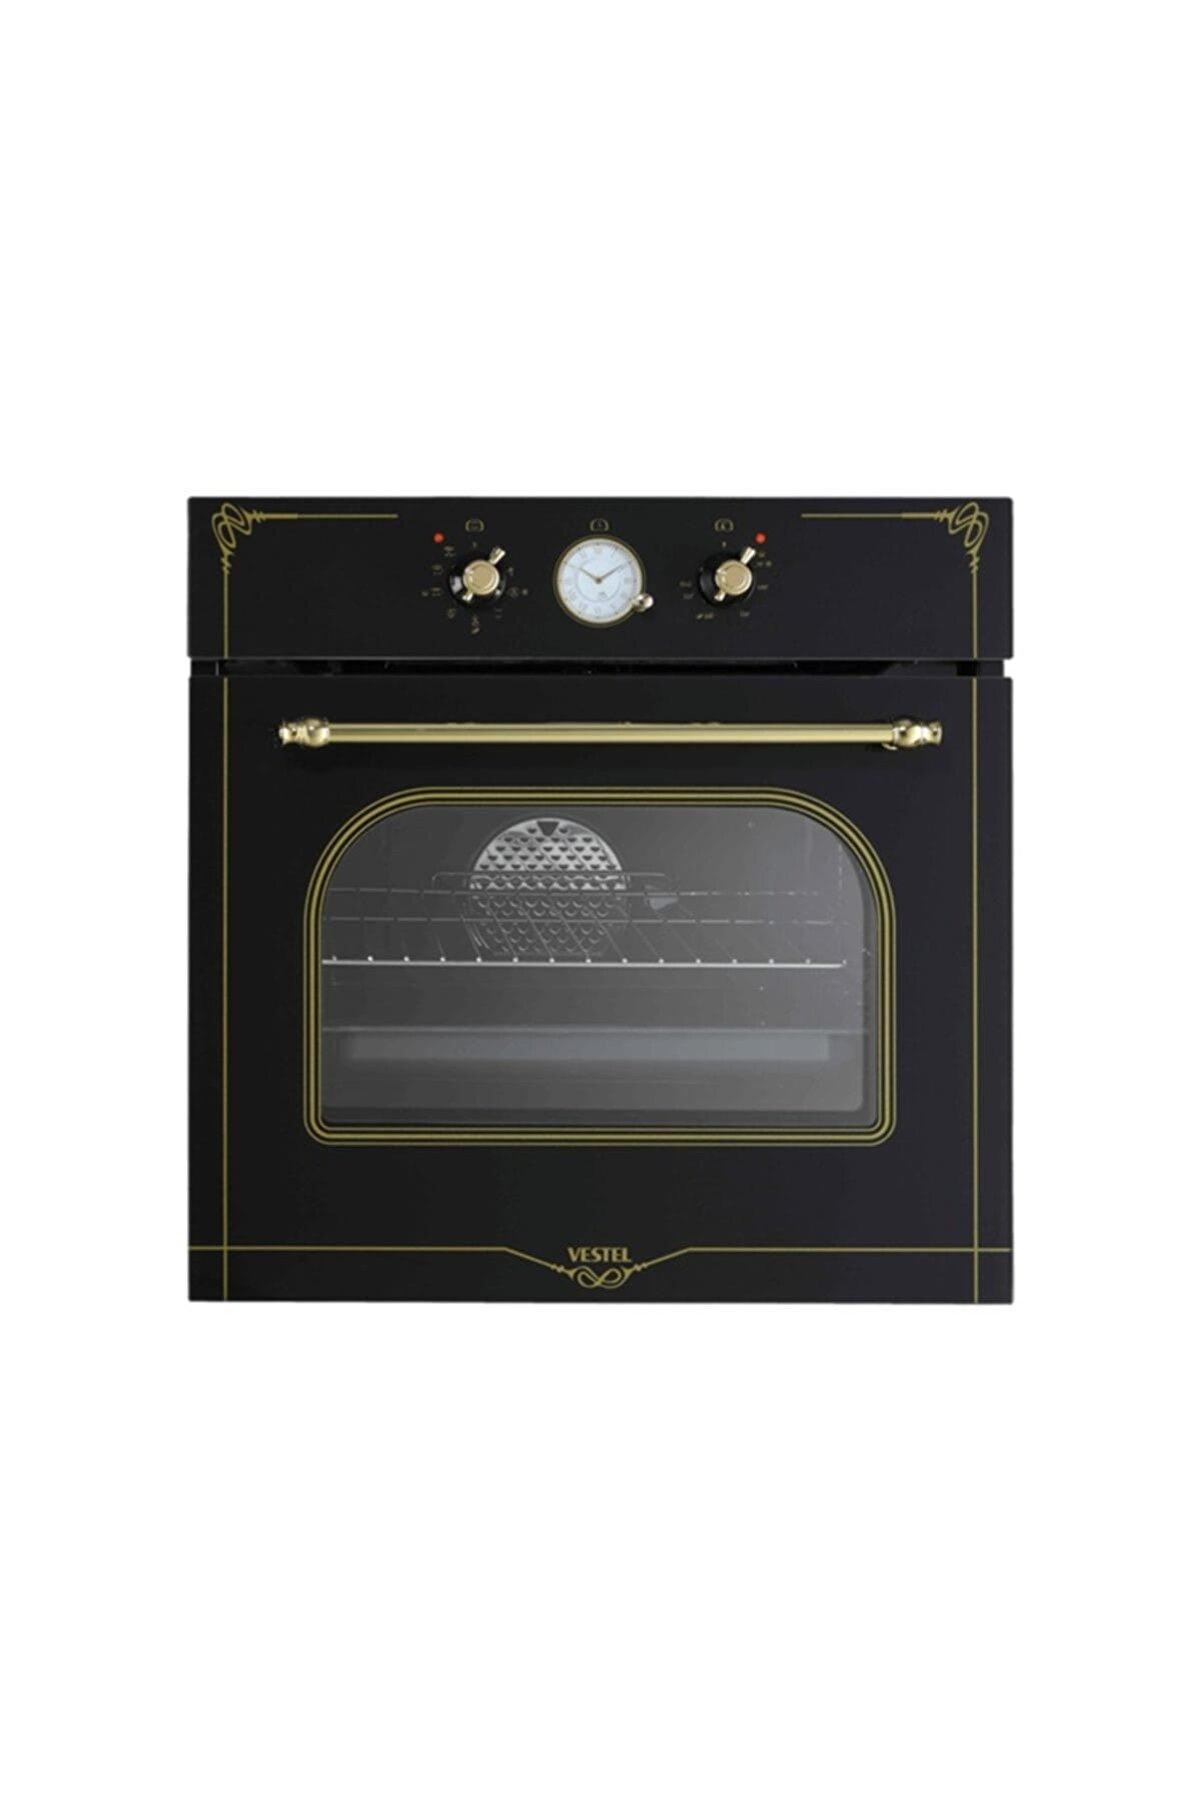 VESTEL AFRB-7688 Rustik Siyah Ankastre Fırın